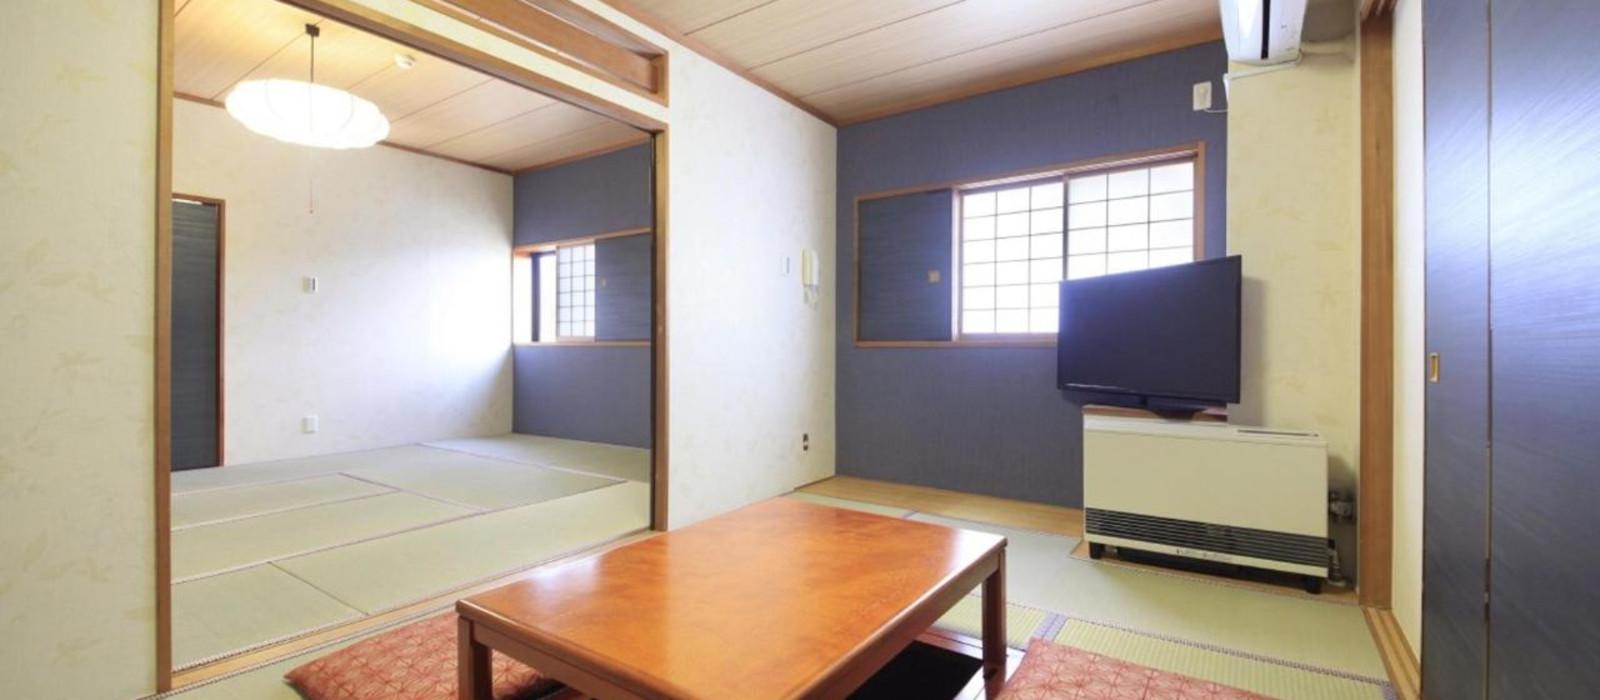 Hotel Yutorelo-an ANNEX Japan